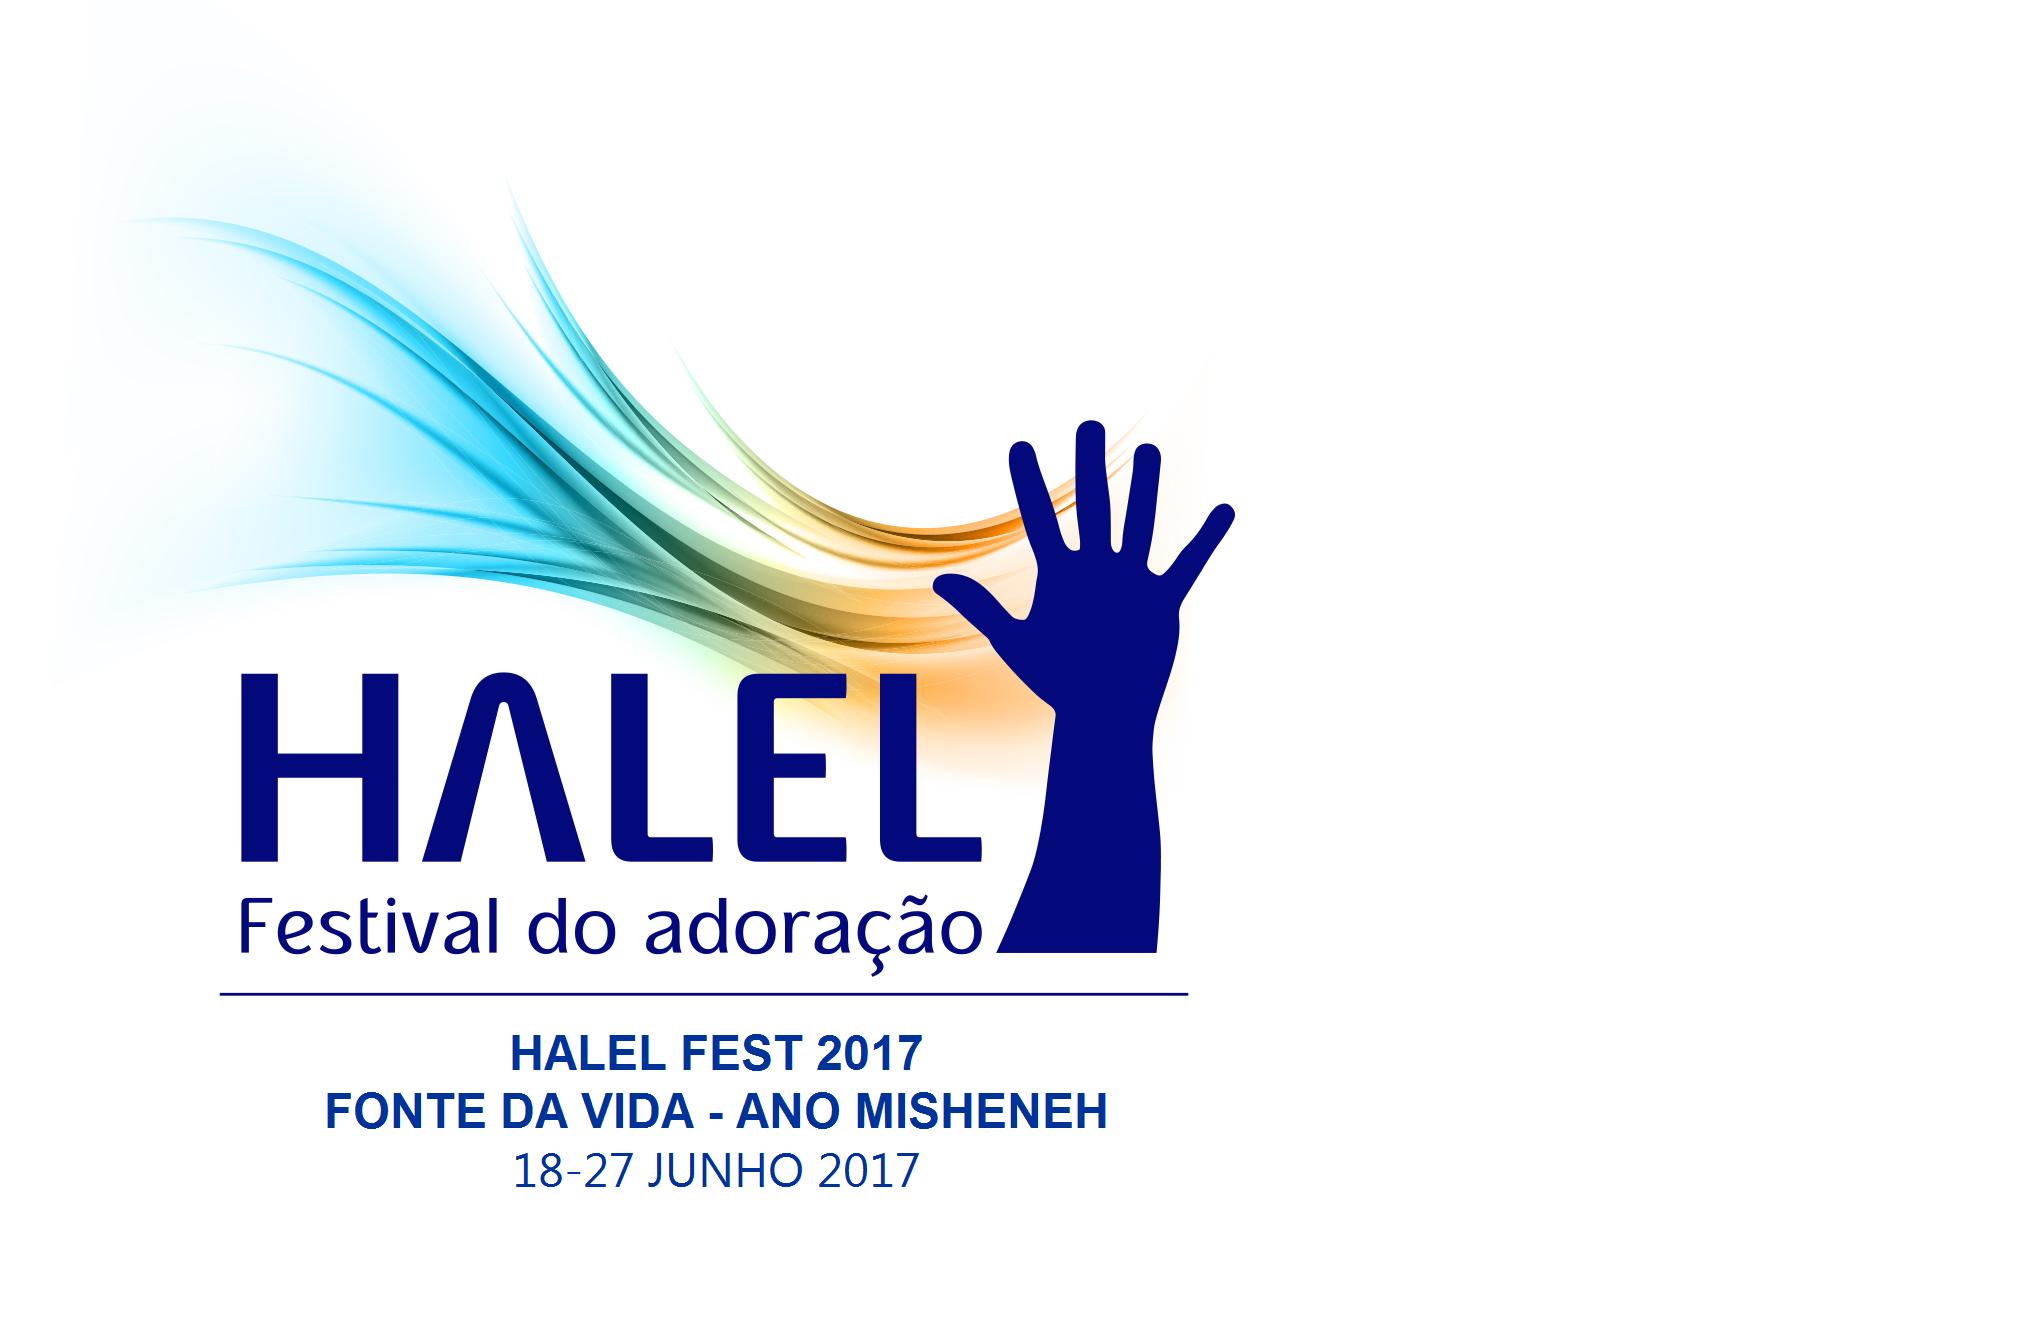 HALEL FEST